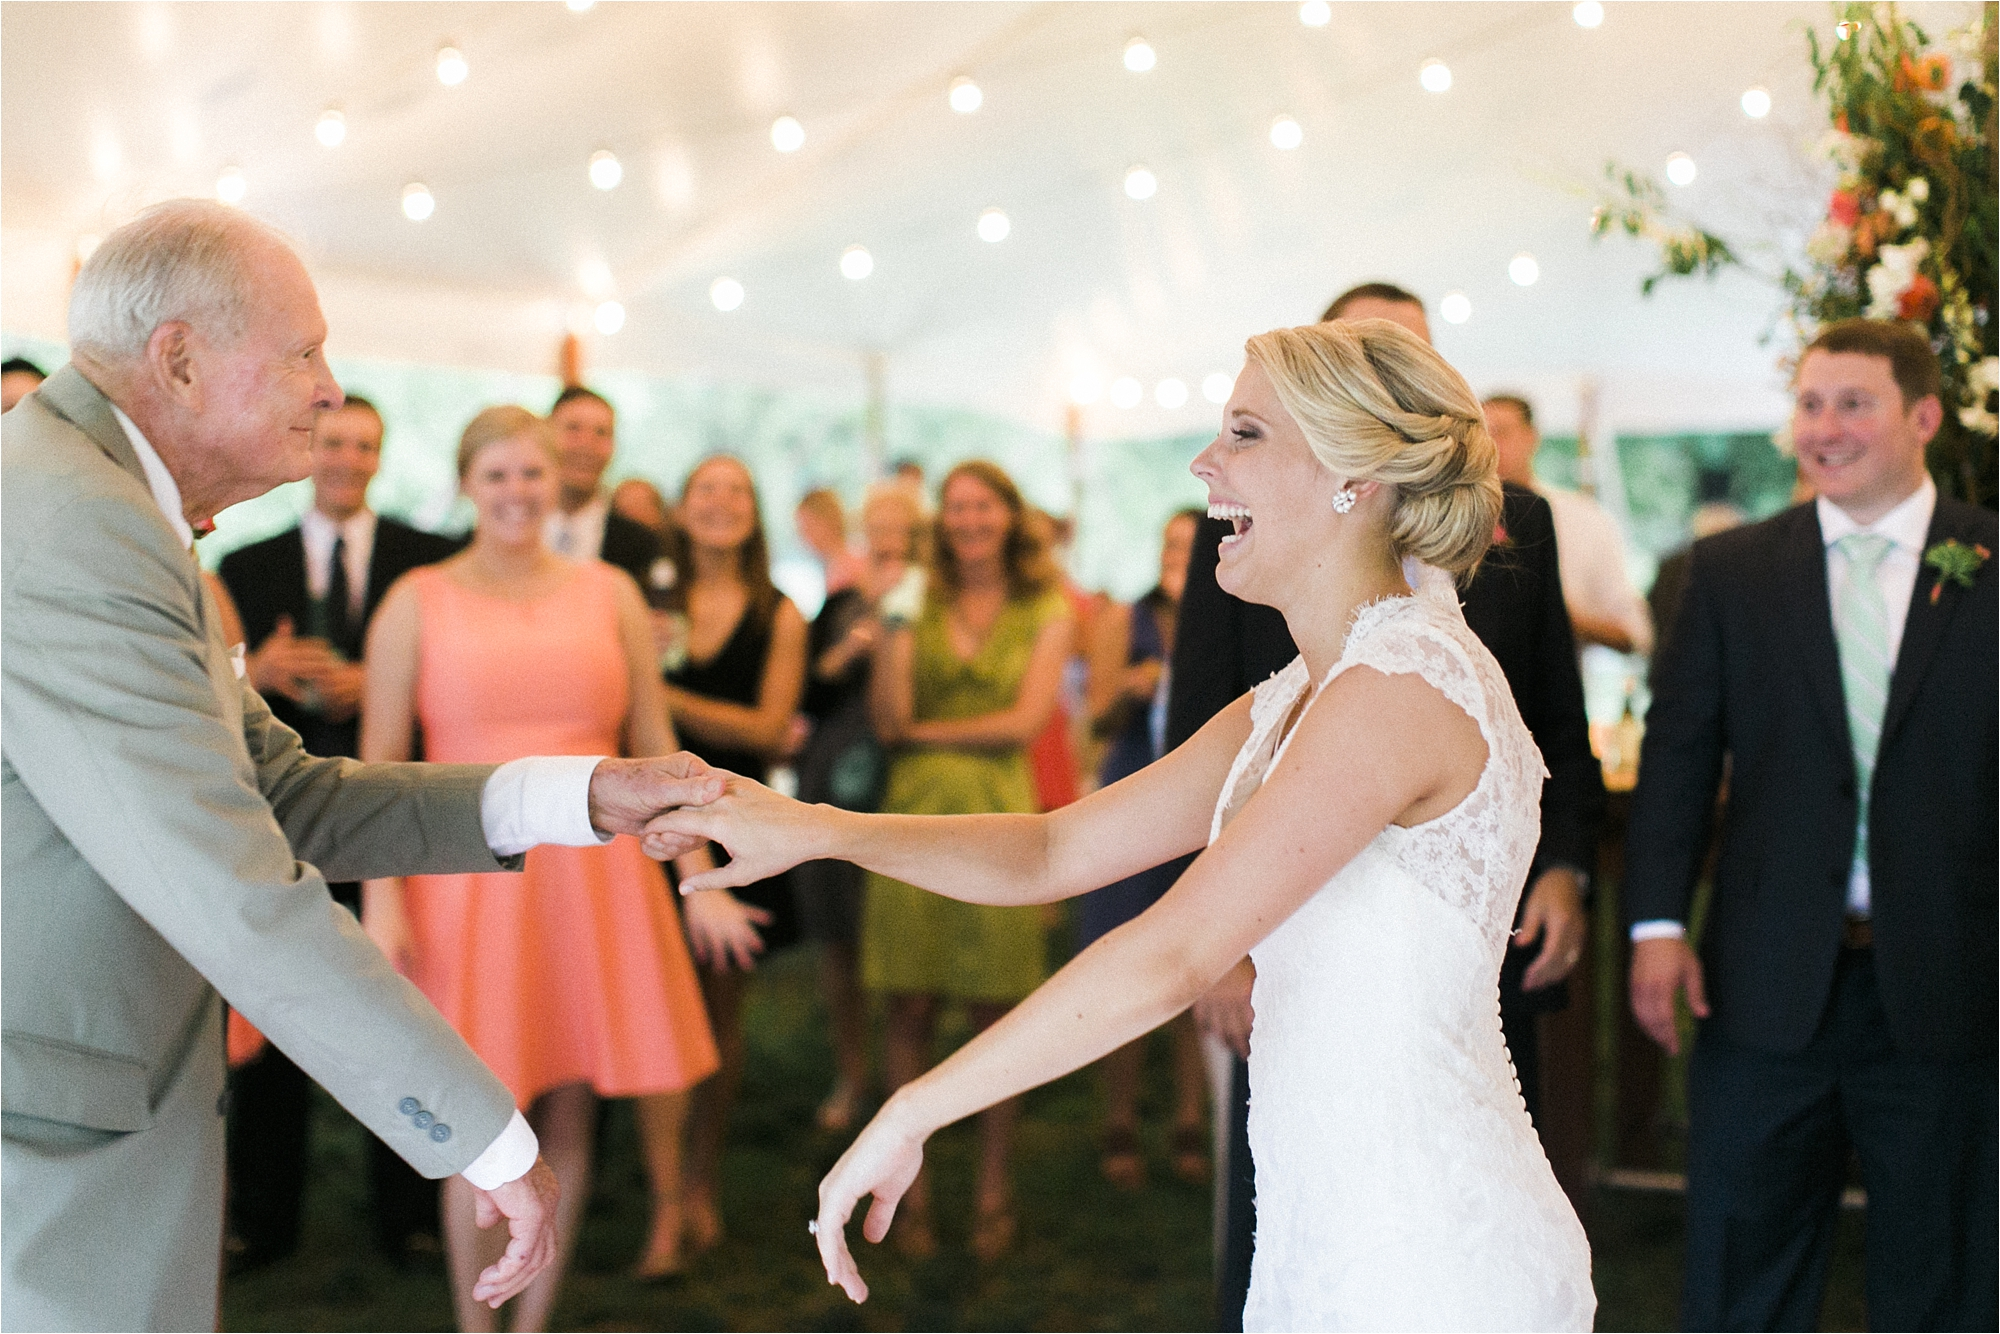 richmond-virginia-tuckahoe-plantation-coral-summer-wedding-stephanie-yonce-photos_0063.jpg